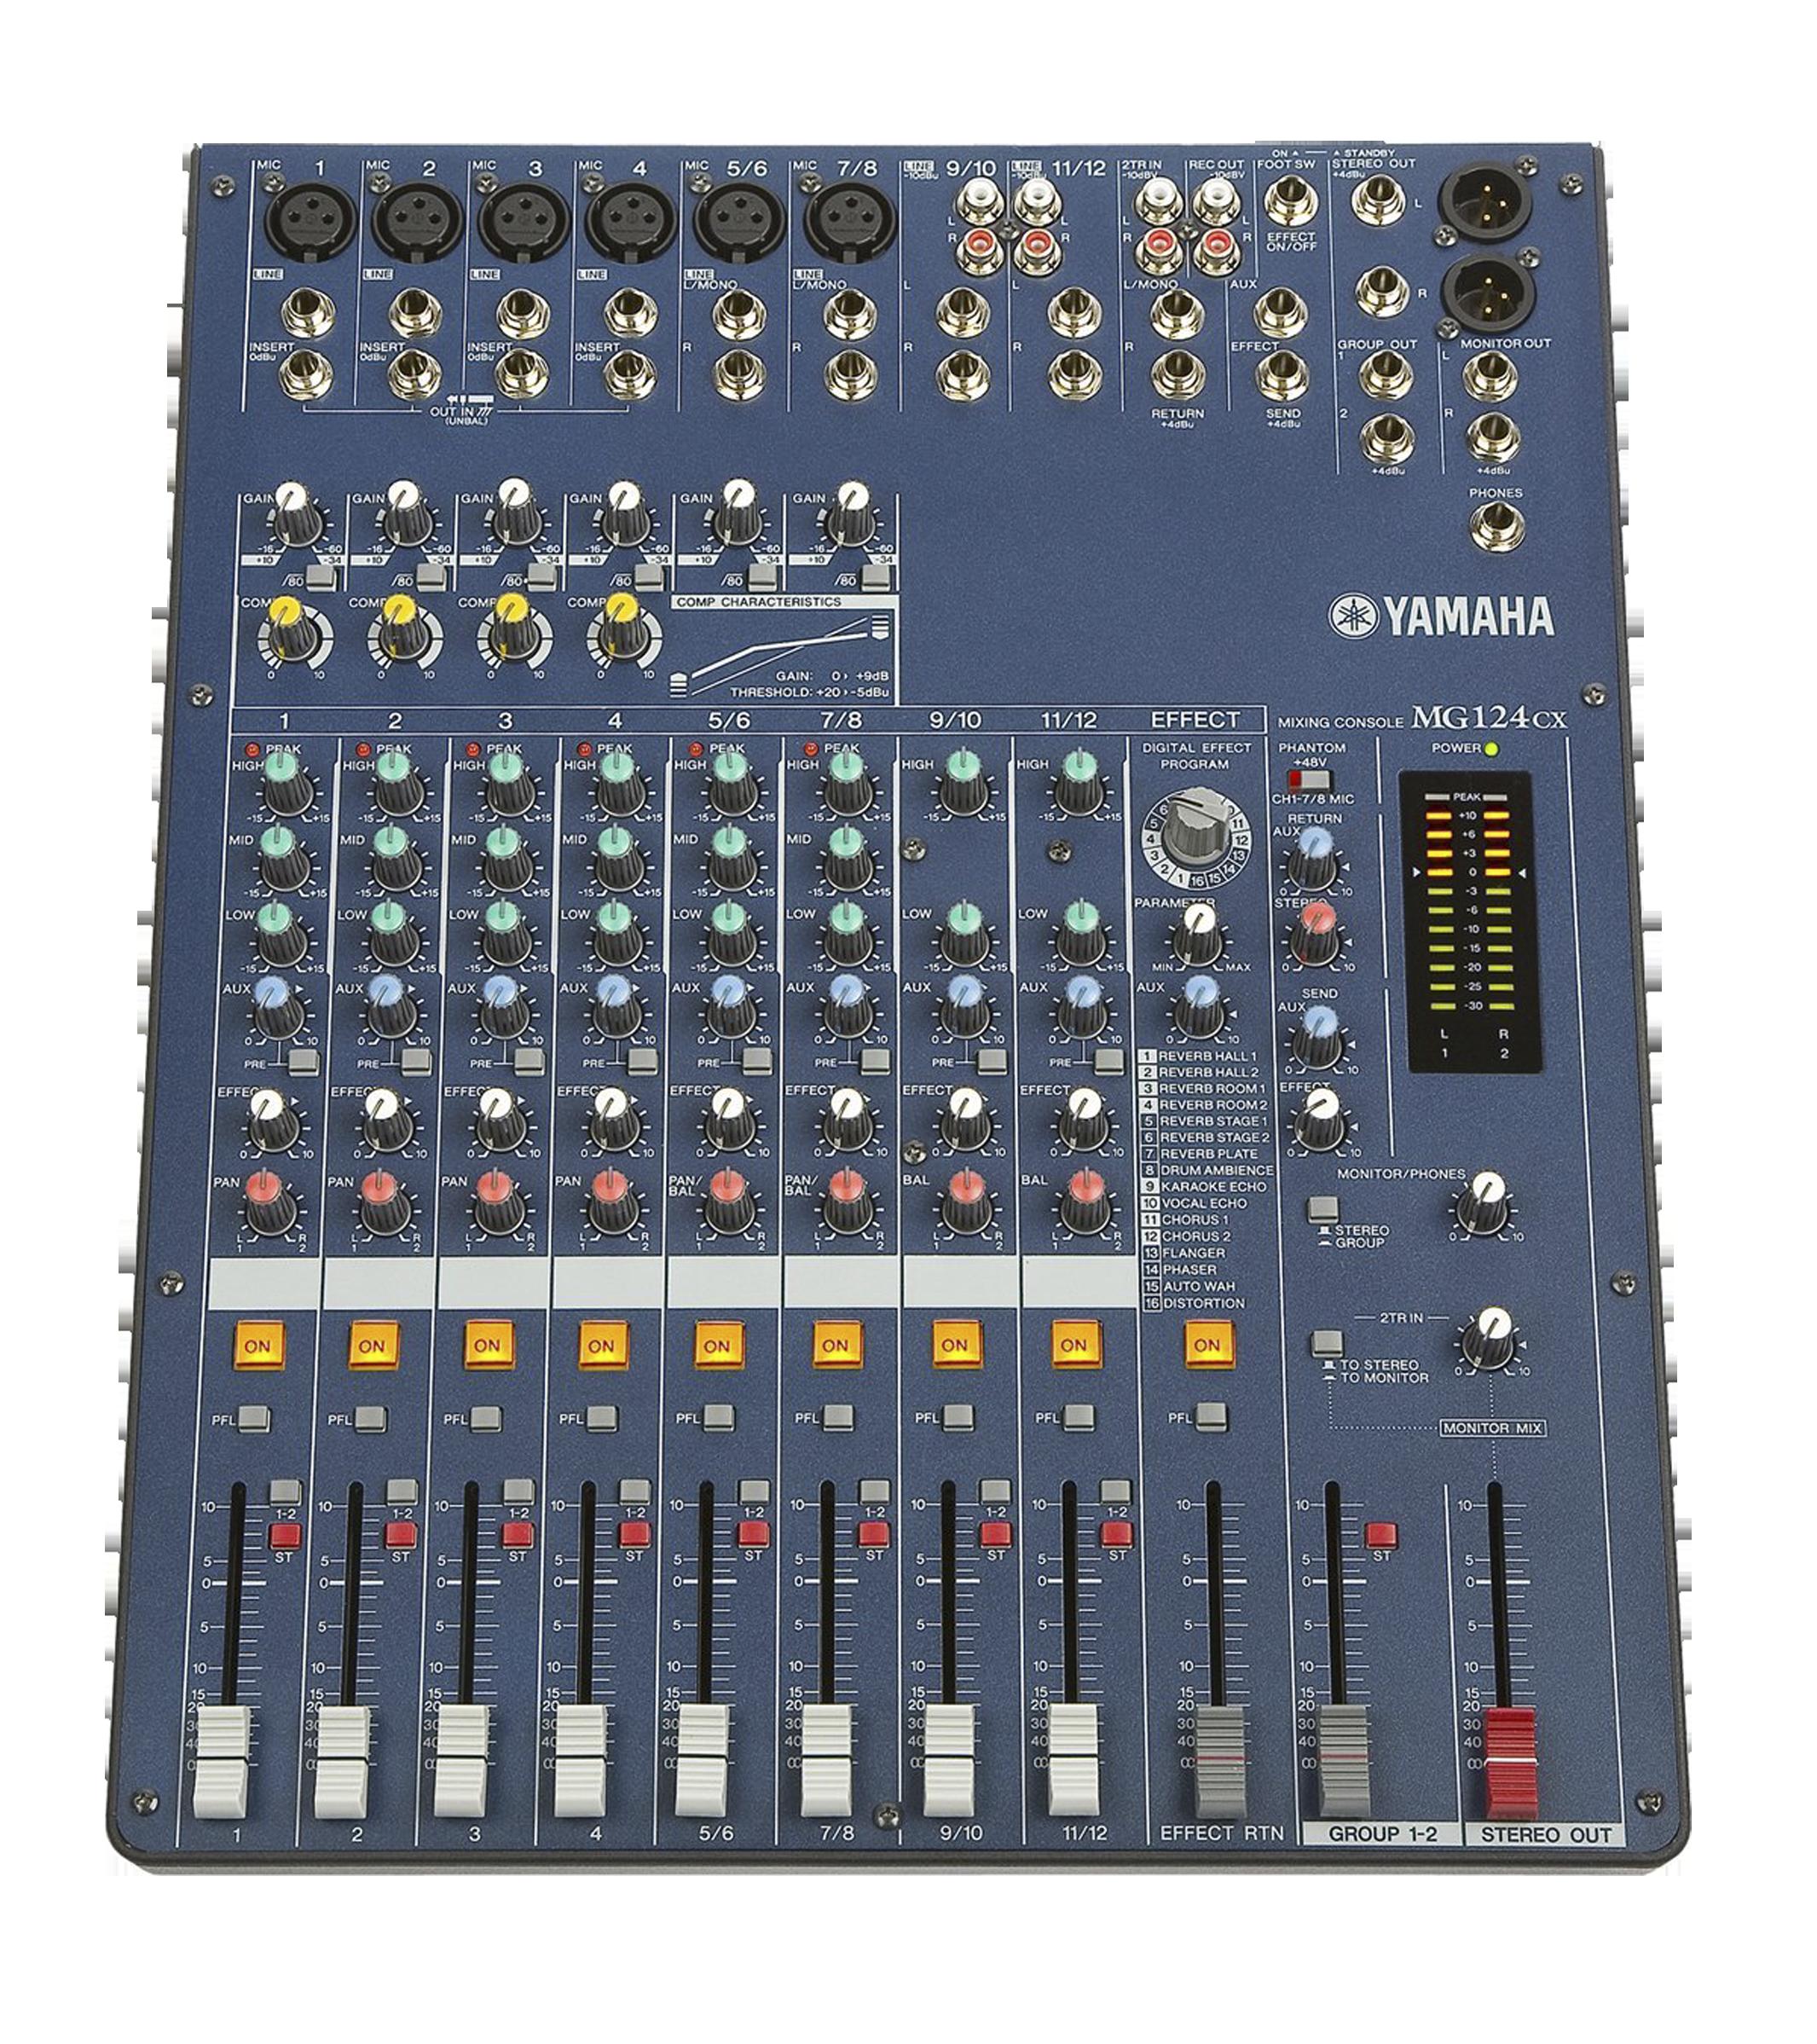 Dj clipart mixing board. Jay kay pro shop